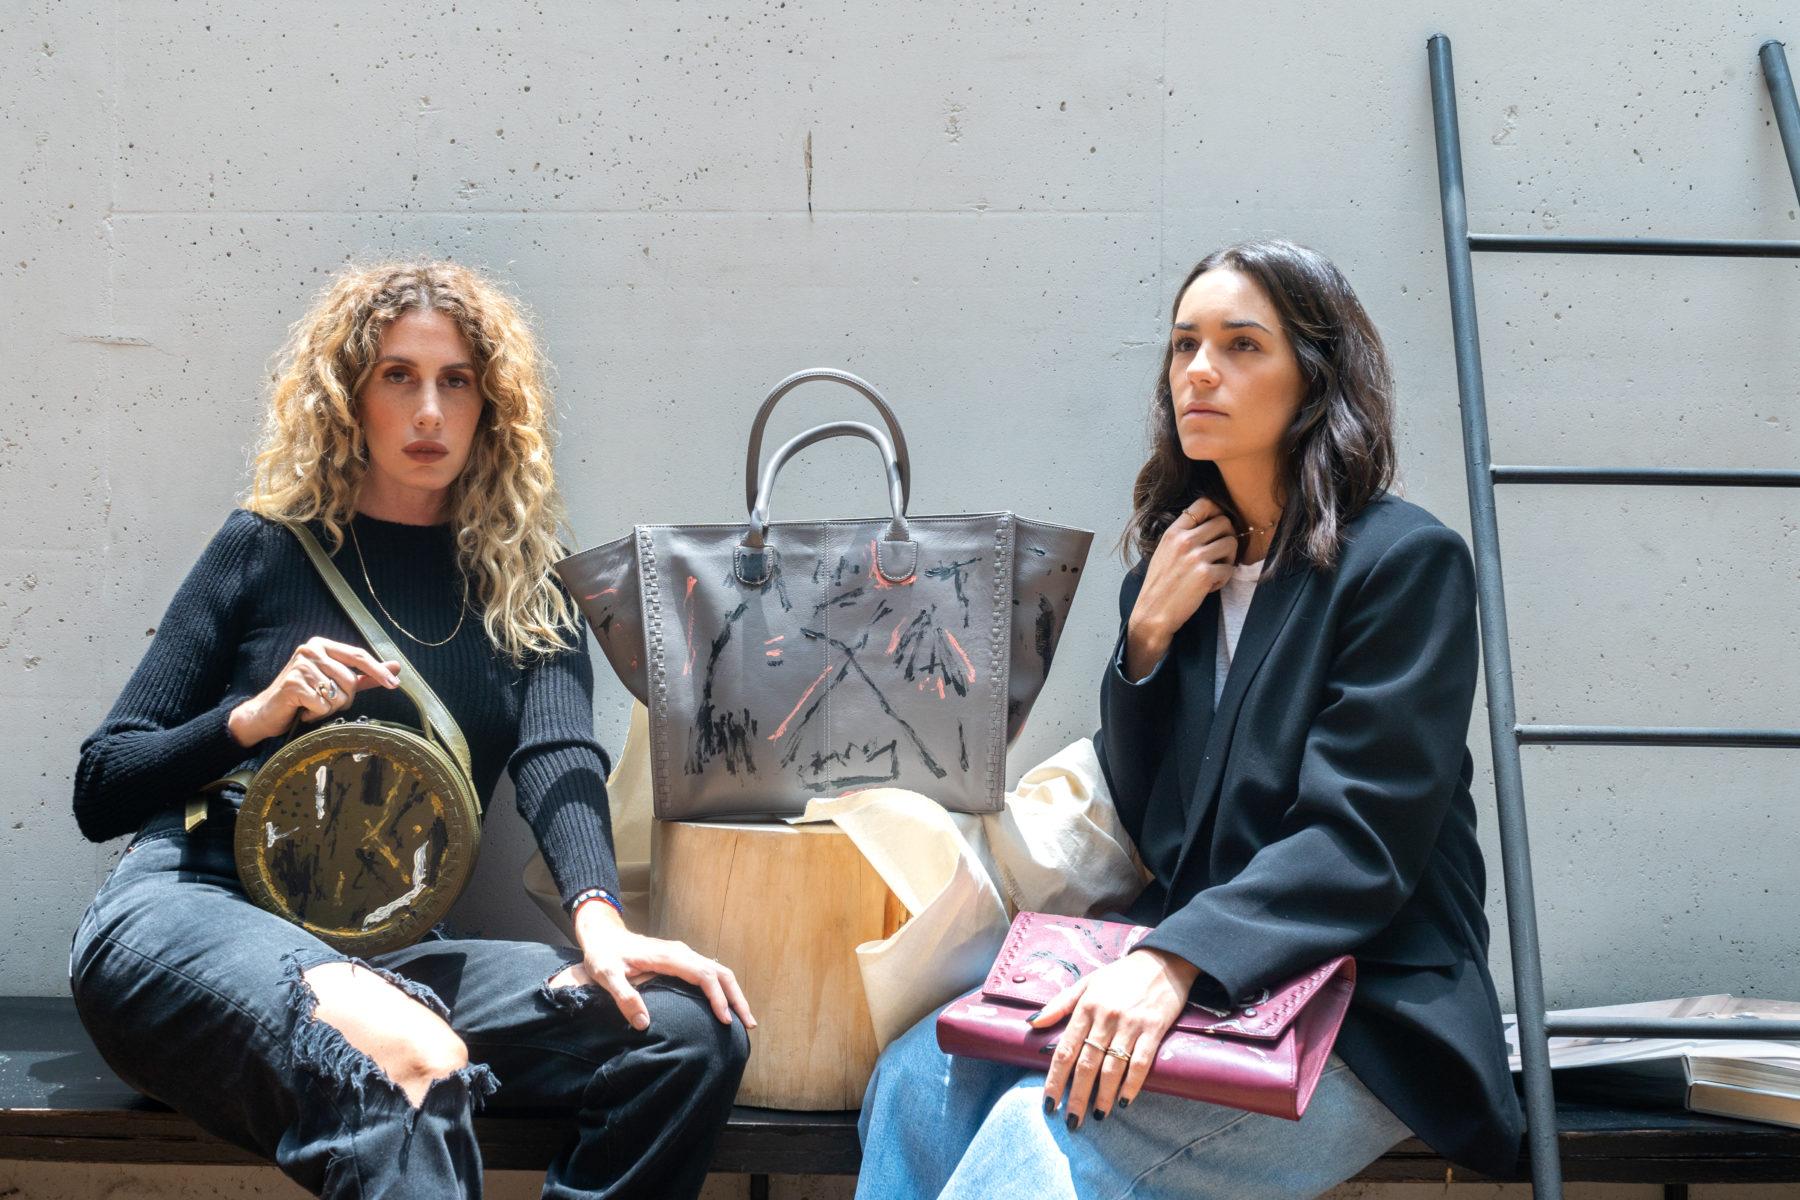 Loun, un proyecto de mujeres para mujeres